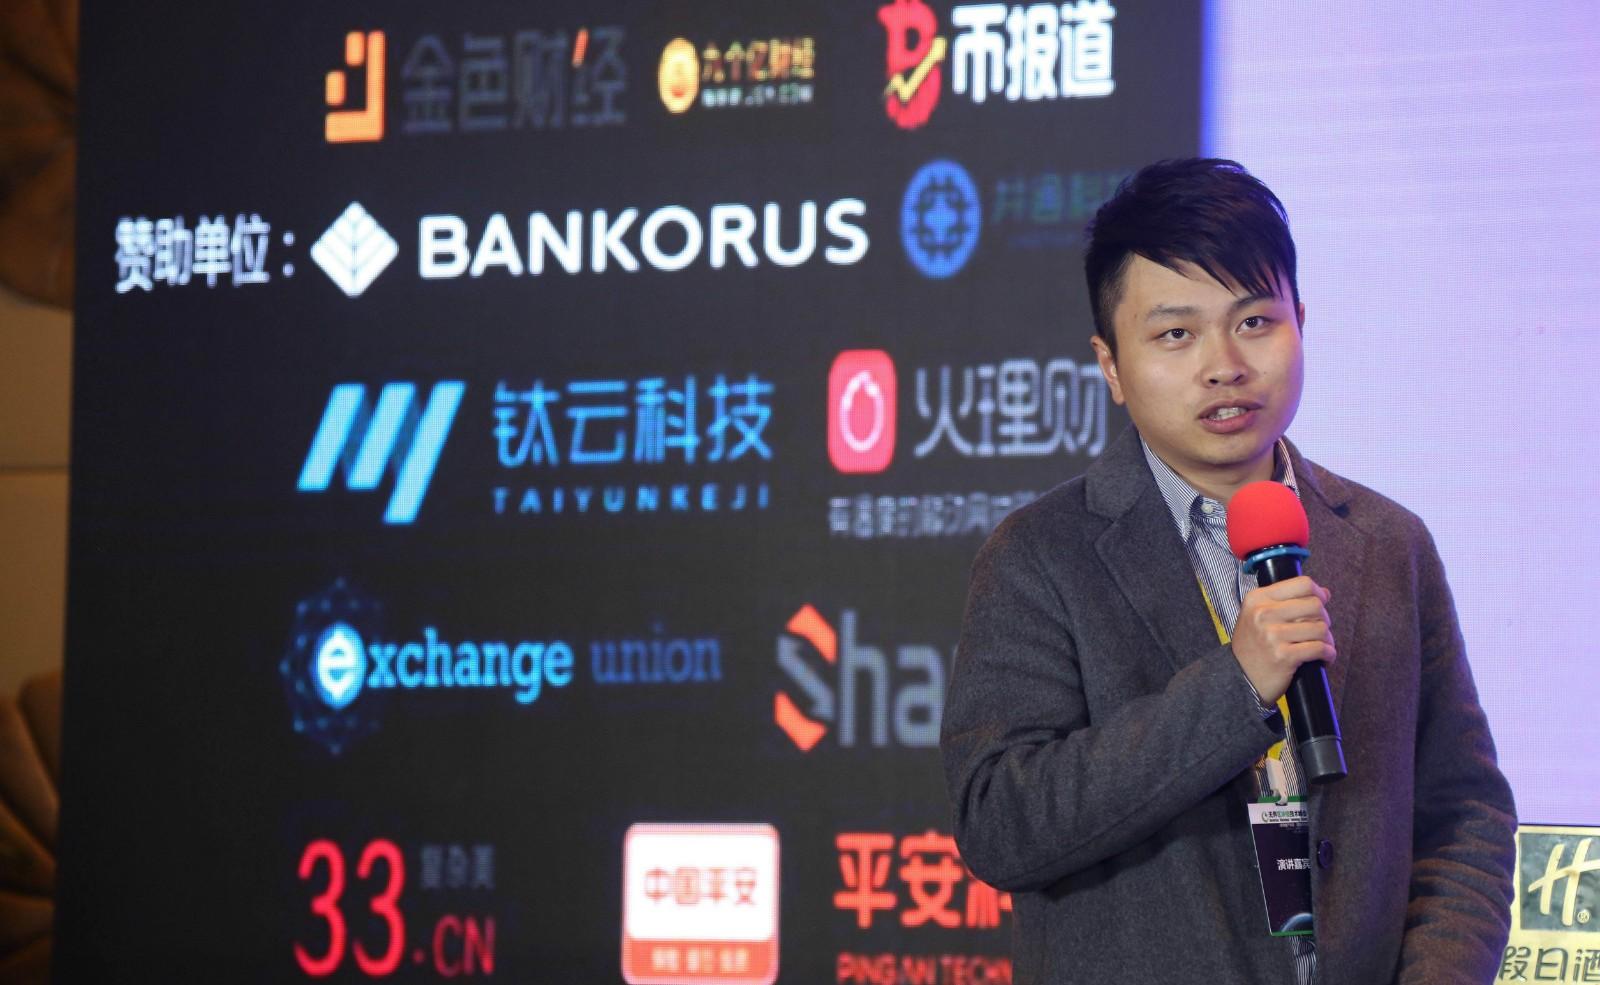 DAEX联合创始人兼首席架构师唐瑞琮:分布式数字资产清算生态